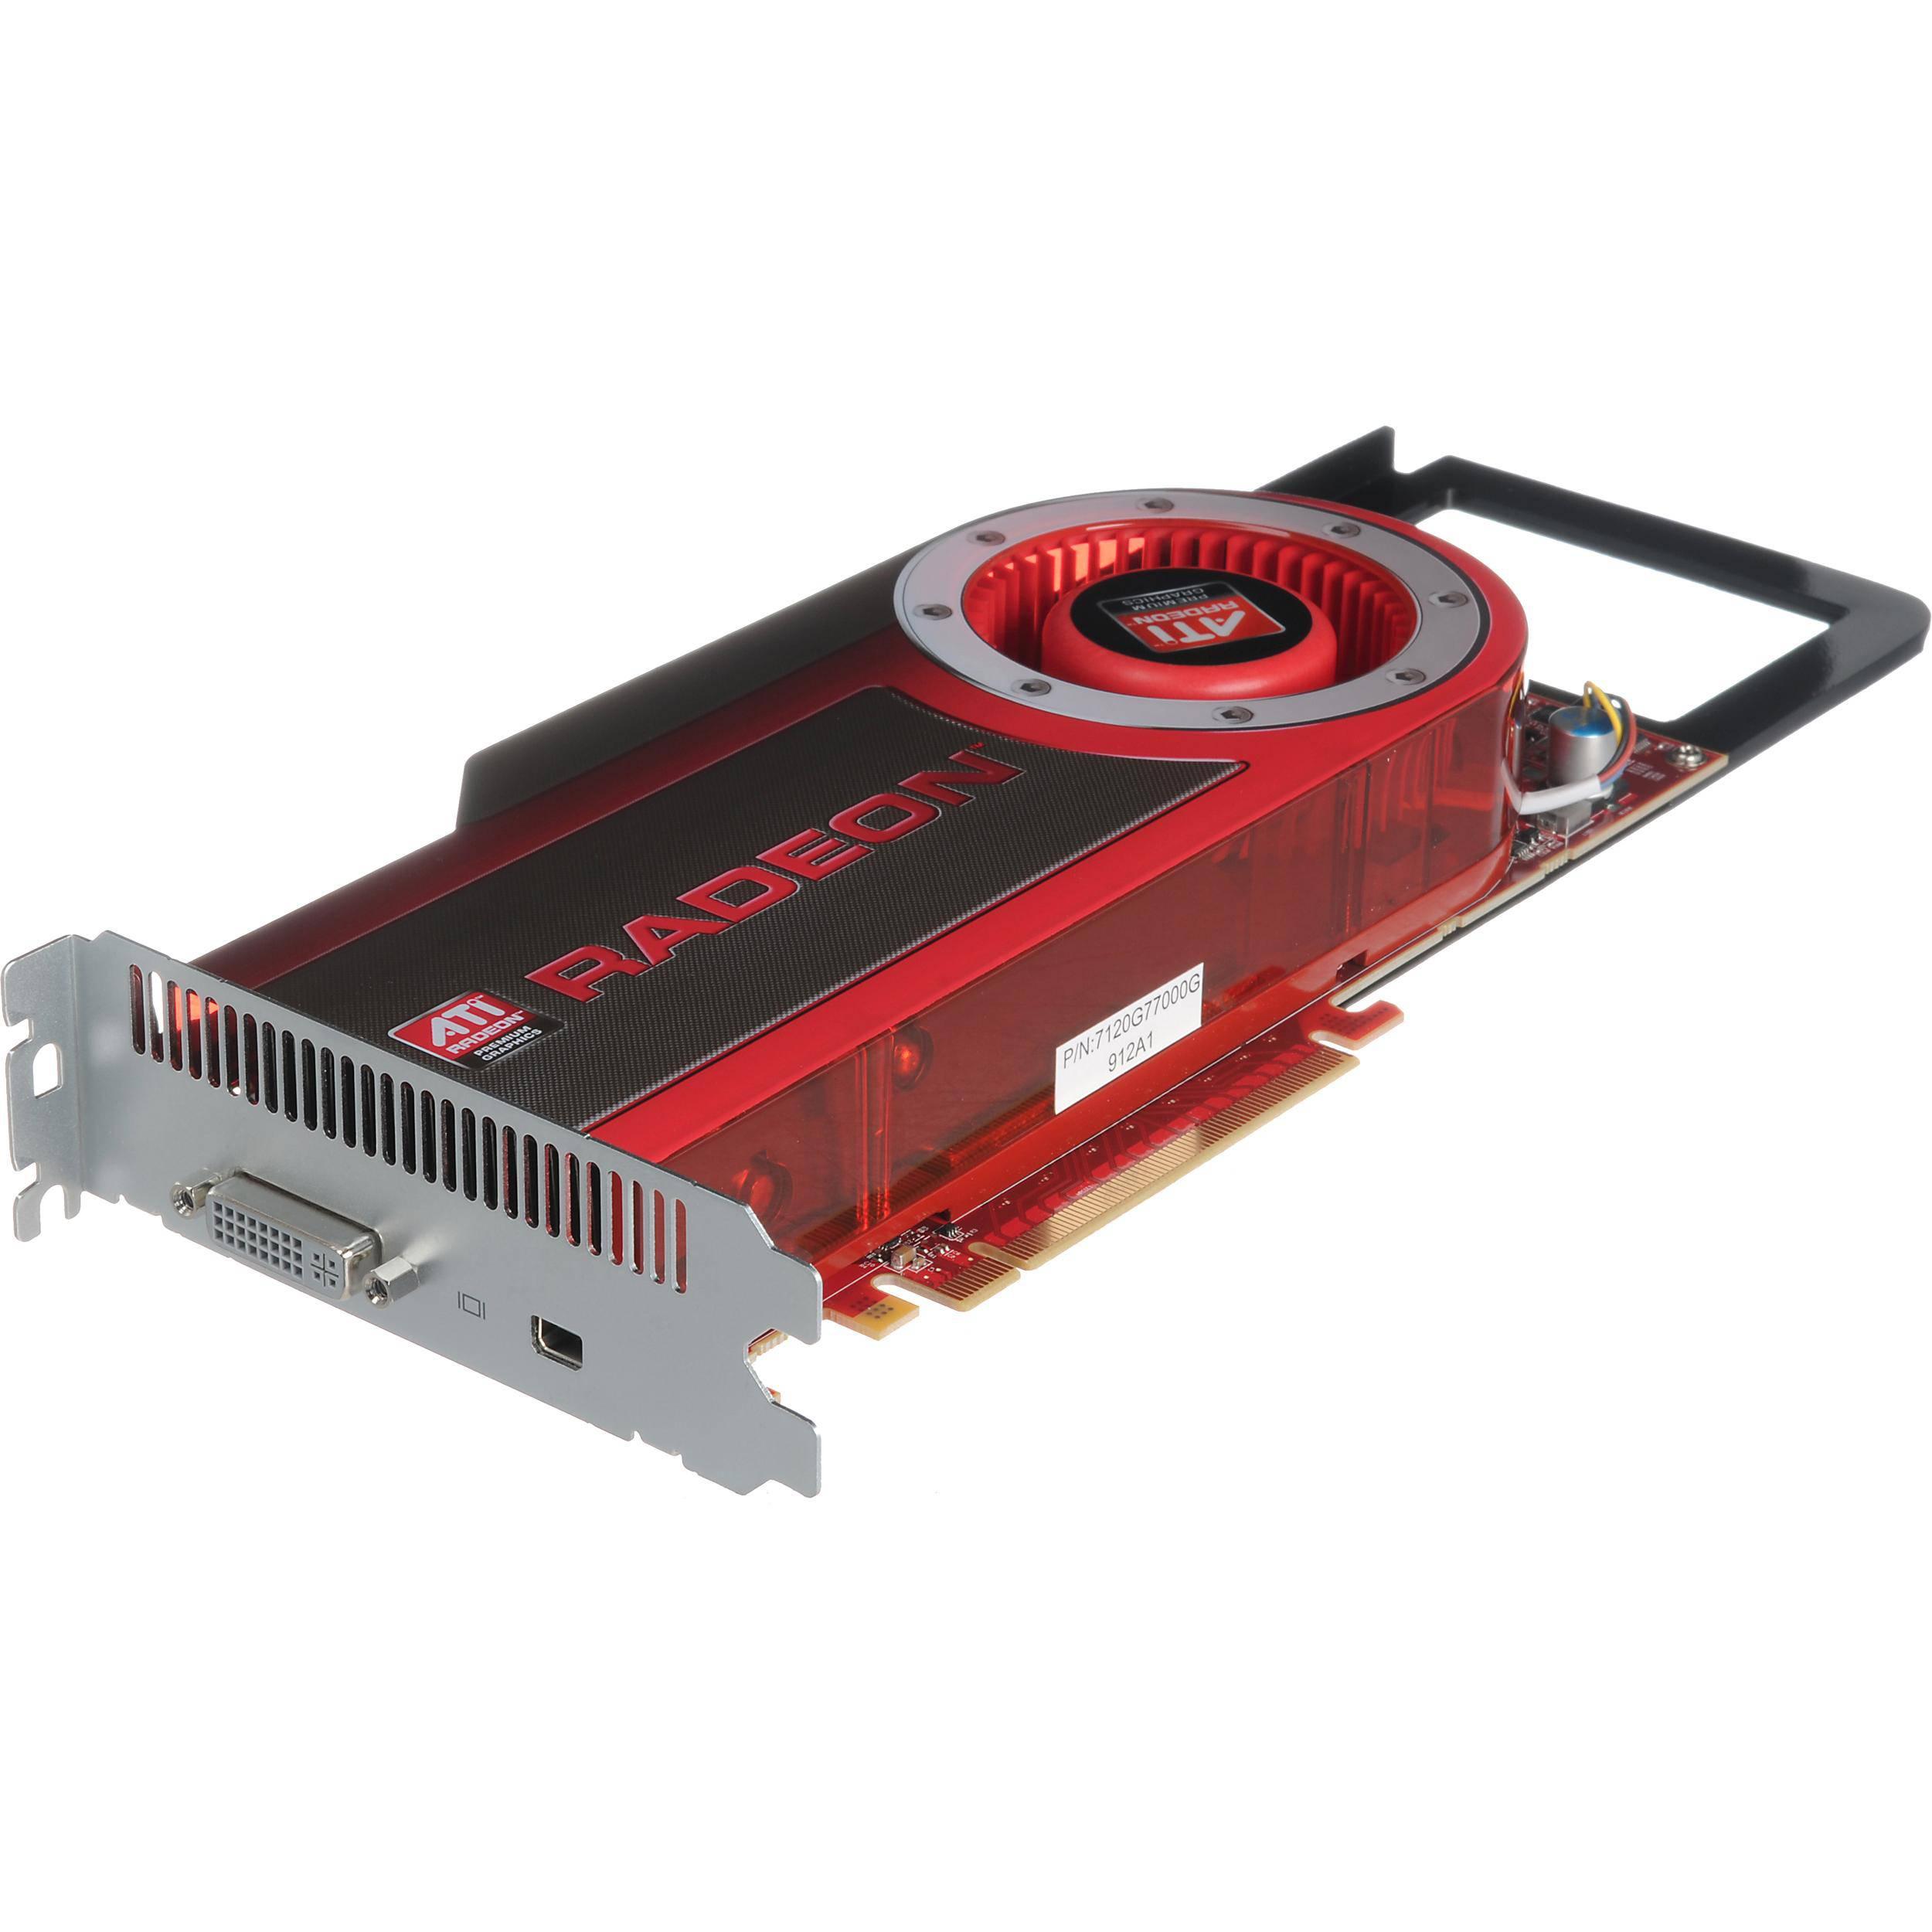 Apple AMD Radeon HD 4870 512MB Graphics Card Kit MB999ZM//A for Mac Pro